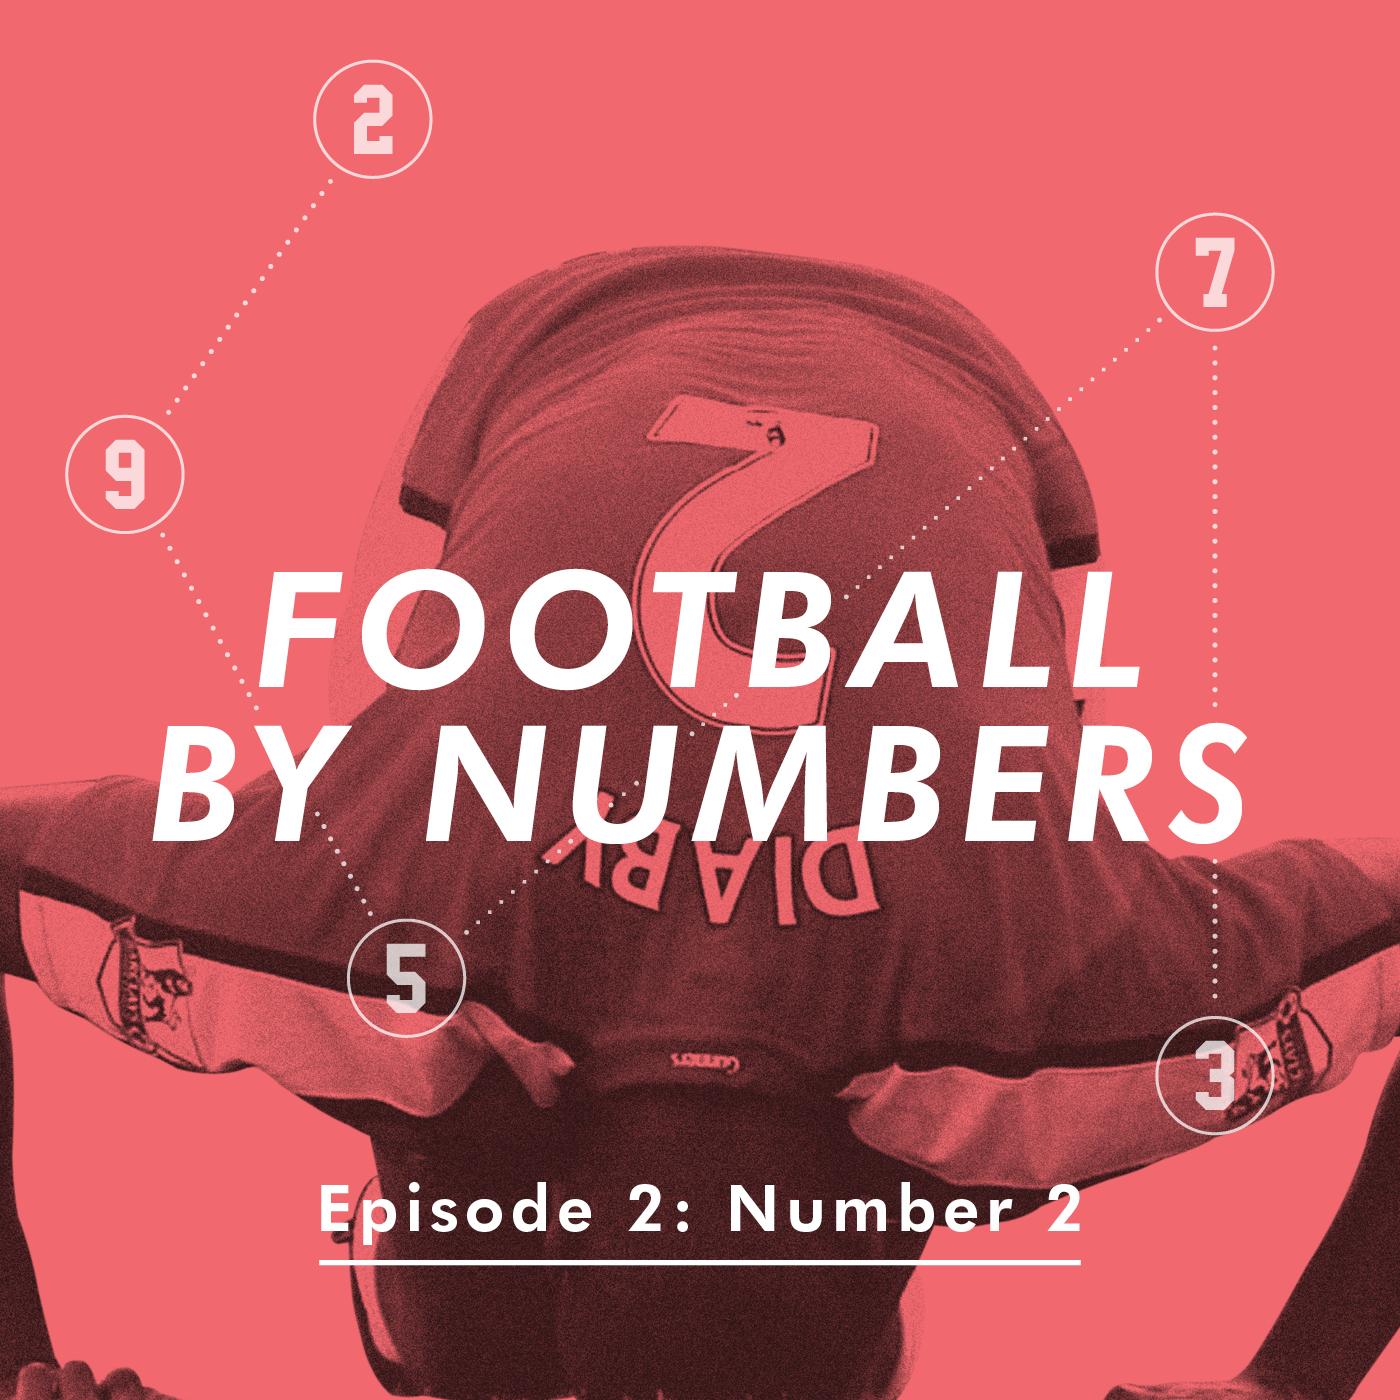 FootballByNumbers-Covers-E2.jpg